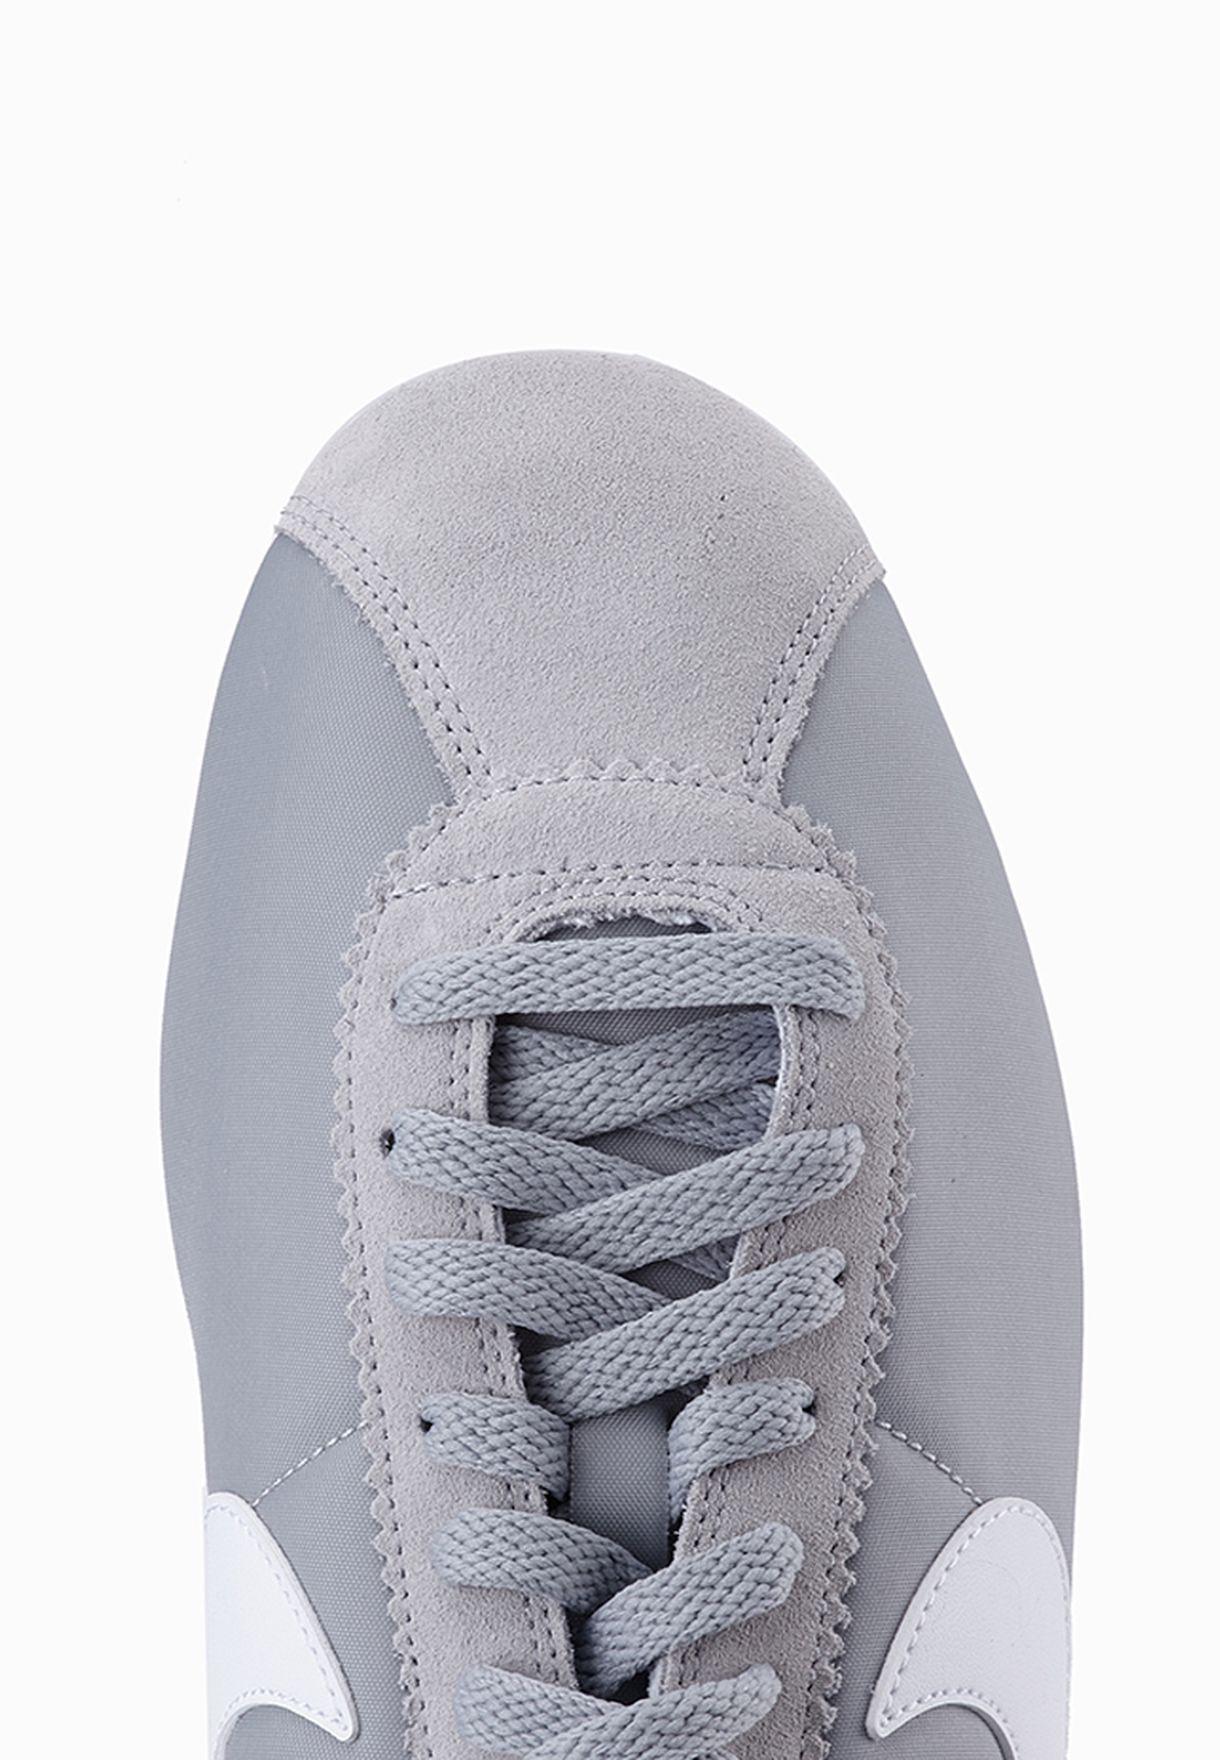 Buen sentimiento Intacto Pasivo  Buy Nike grey Classic Cortez Nylon for Men in MENA, Worldwide | 532487-018